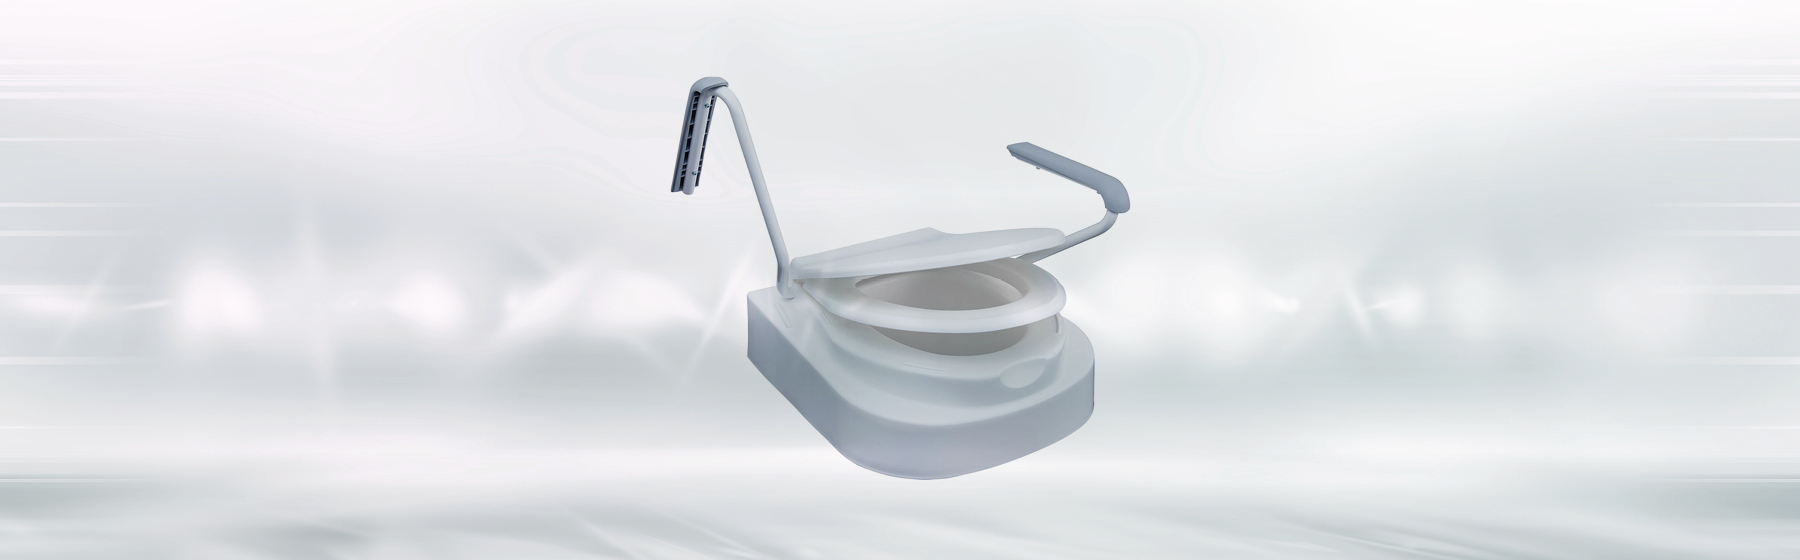 SMB-Dusche-Bad-Rubrikenmotiv-Toilettensitzerhoehungen